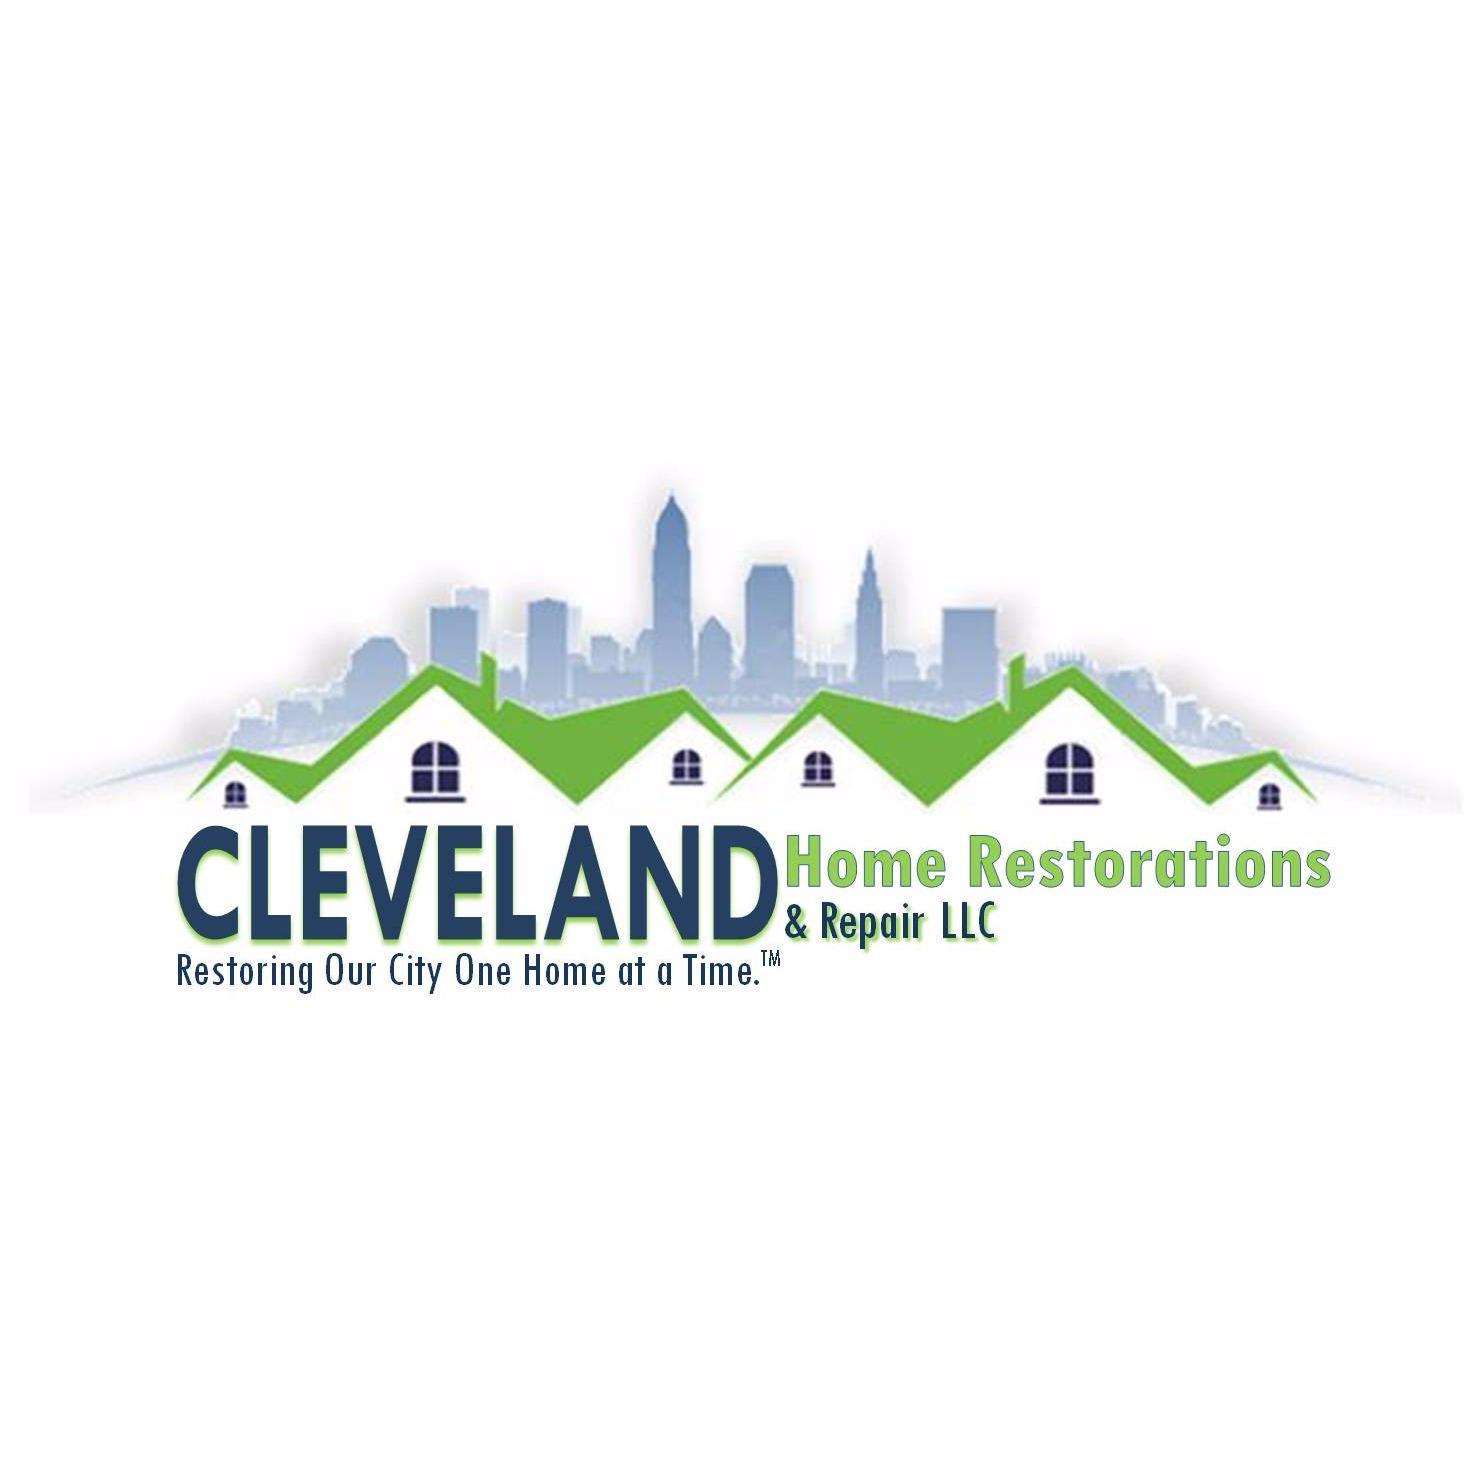 Cleveland Home Restorations